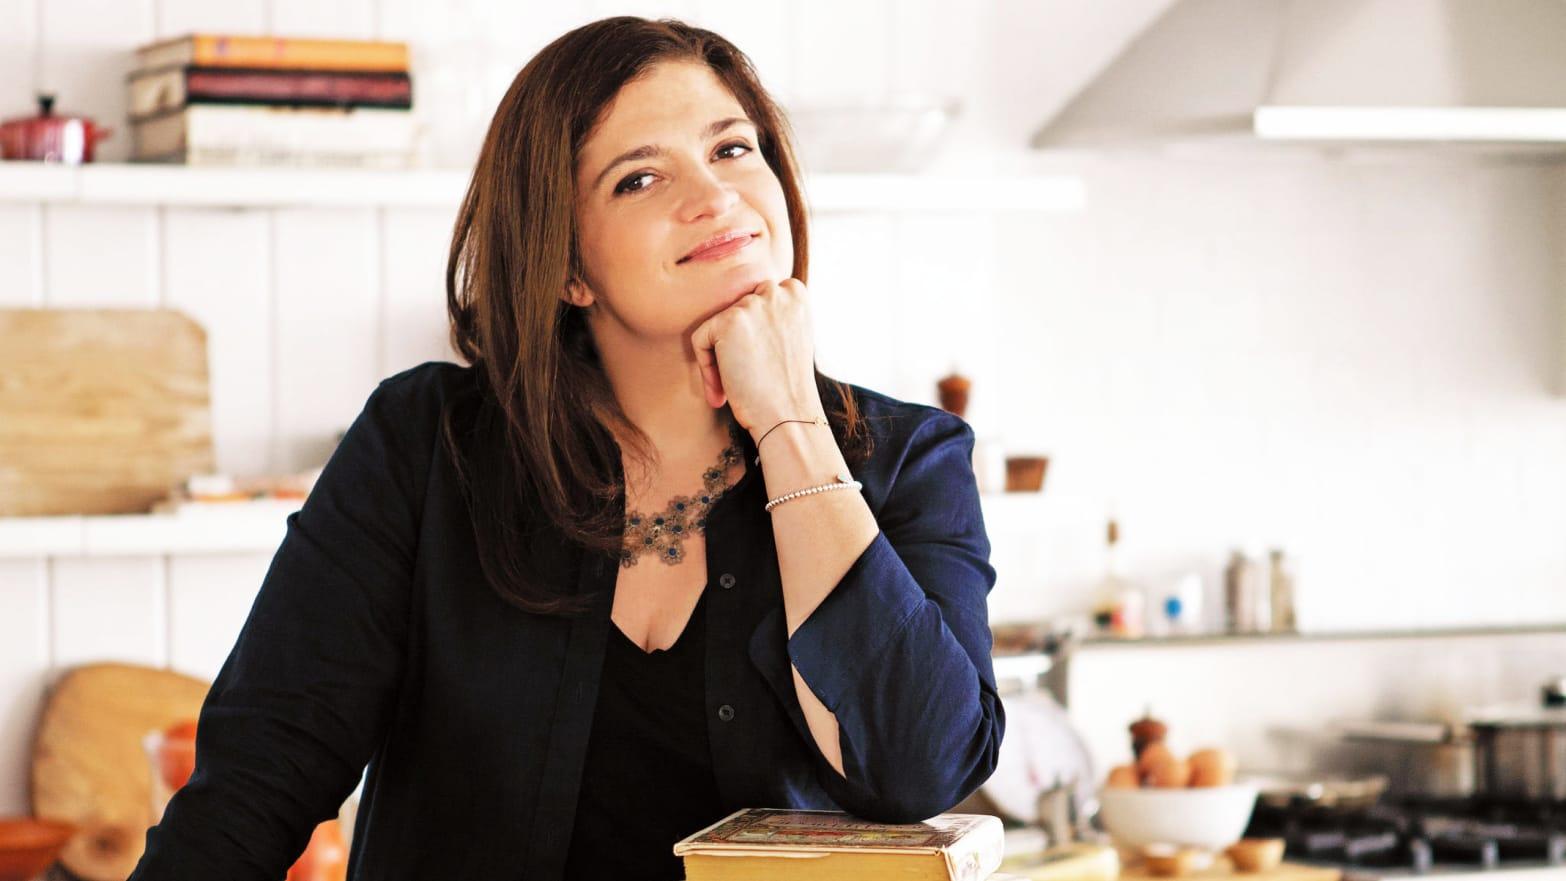 10 Dishes With Celebrity Chef Alex Guarnaschelli